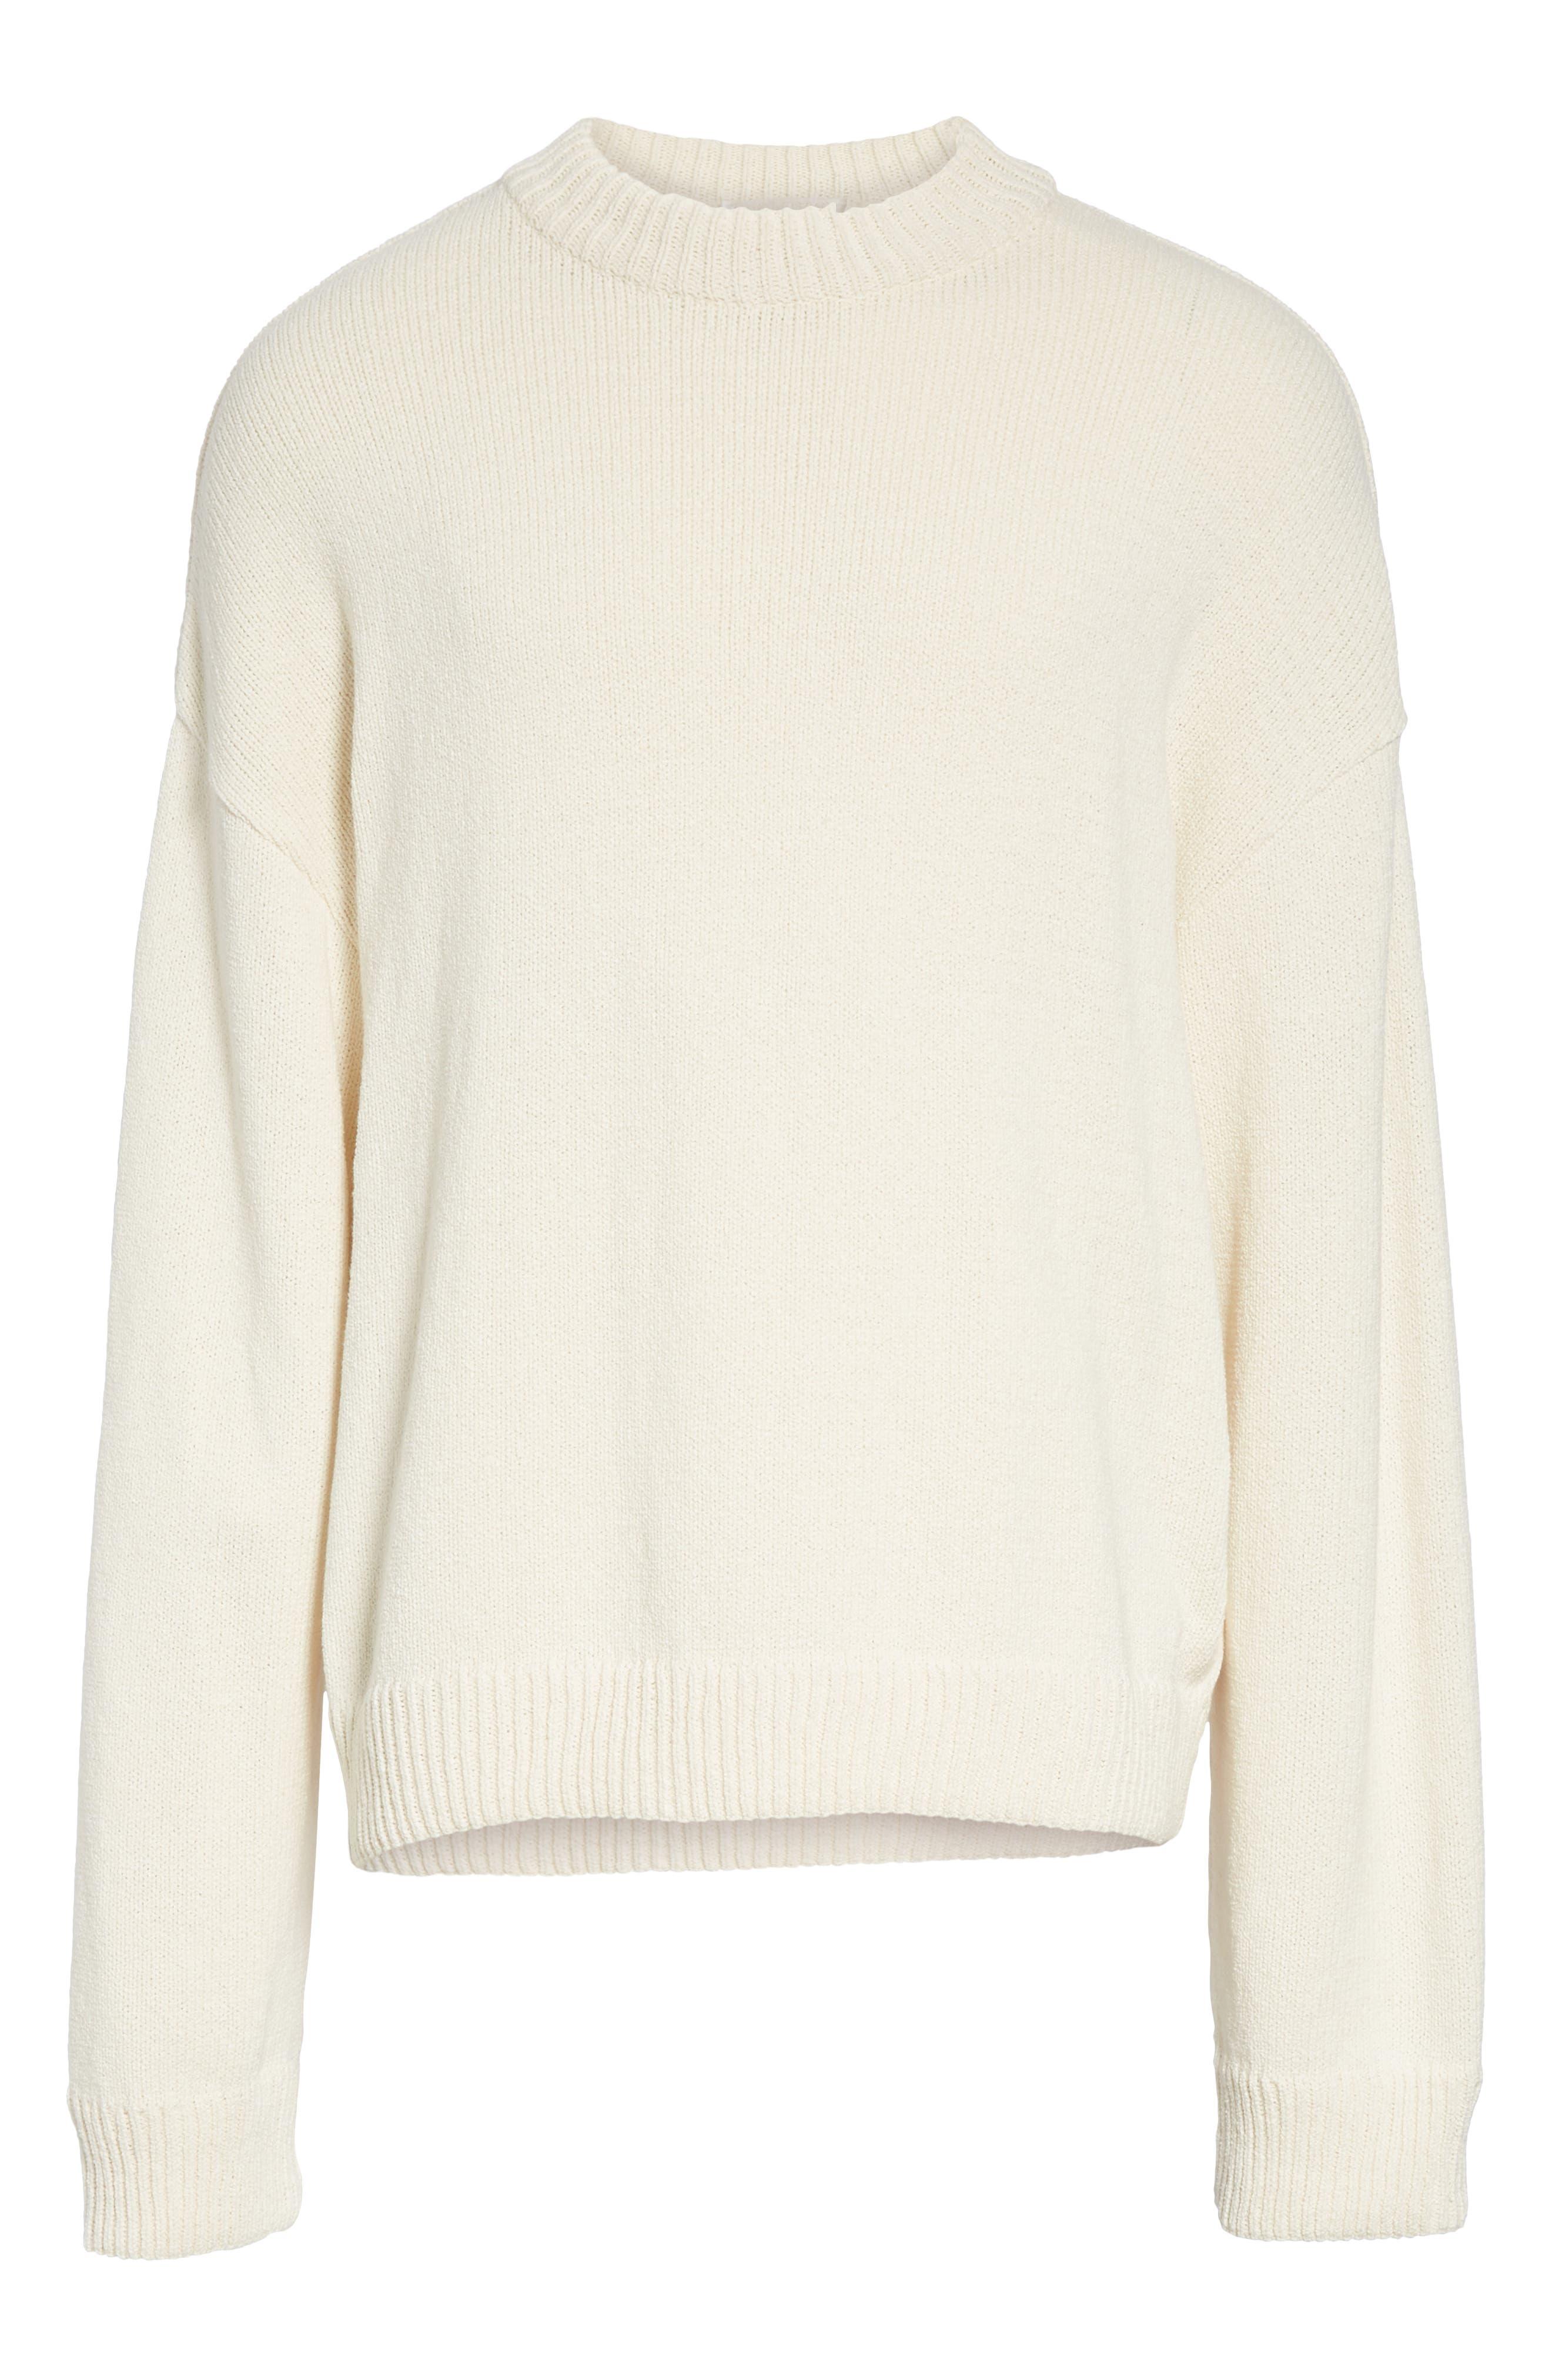 Somar Oversized Crewneck Sweater,                             Alternate thumbnail 6, color,                             100